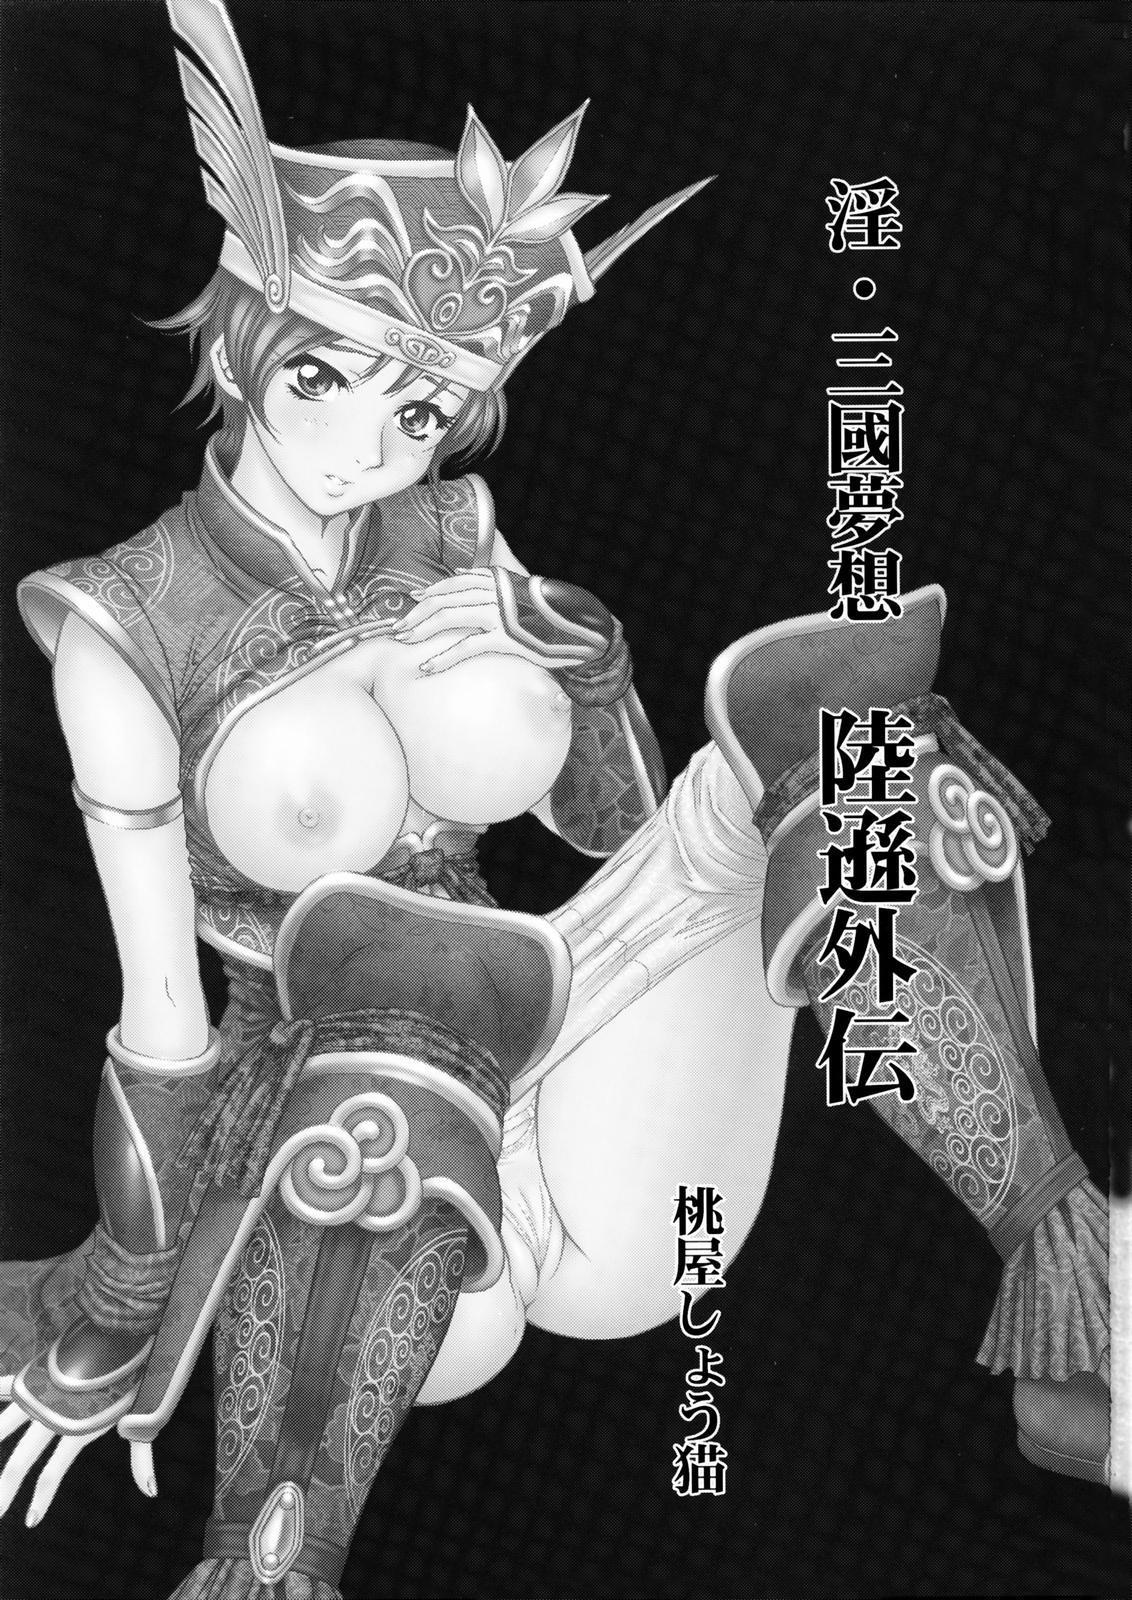 In Sangoku Musou Rikuson Gaiden | Dynasty Warriors: Rikuson's Story 1